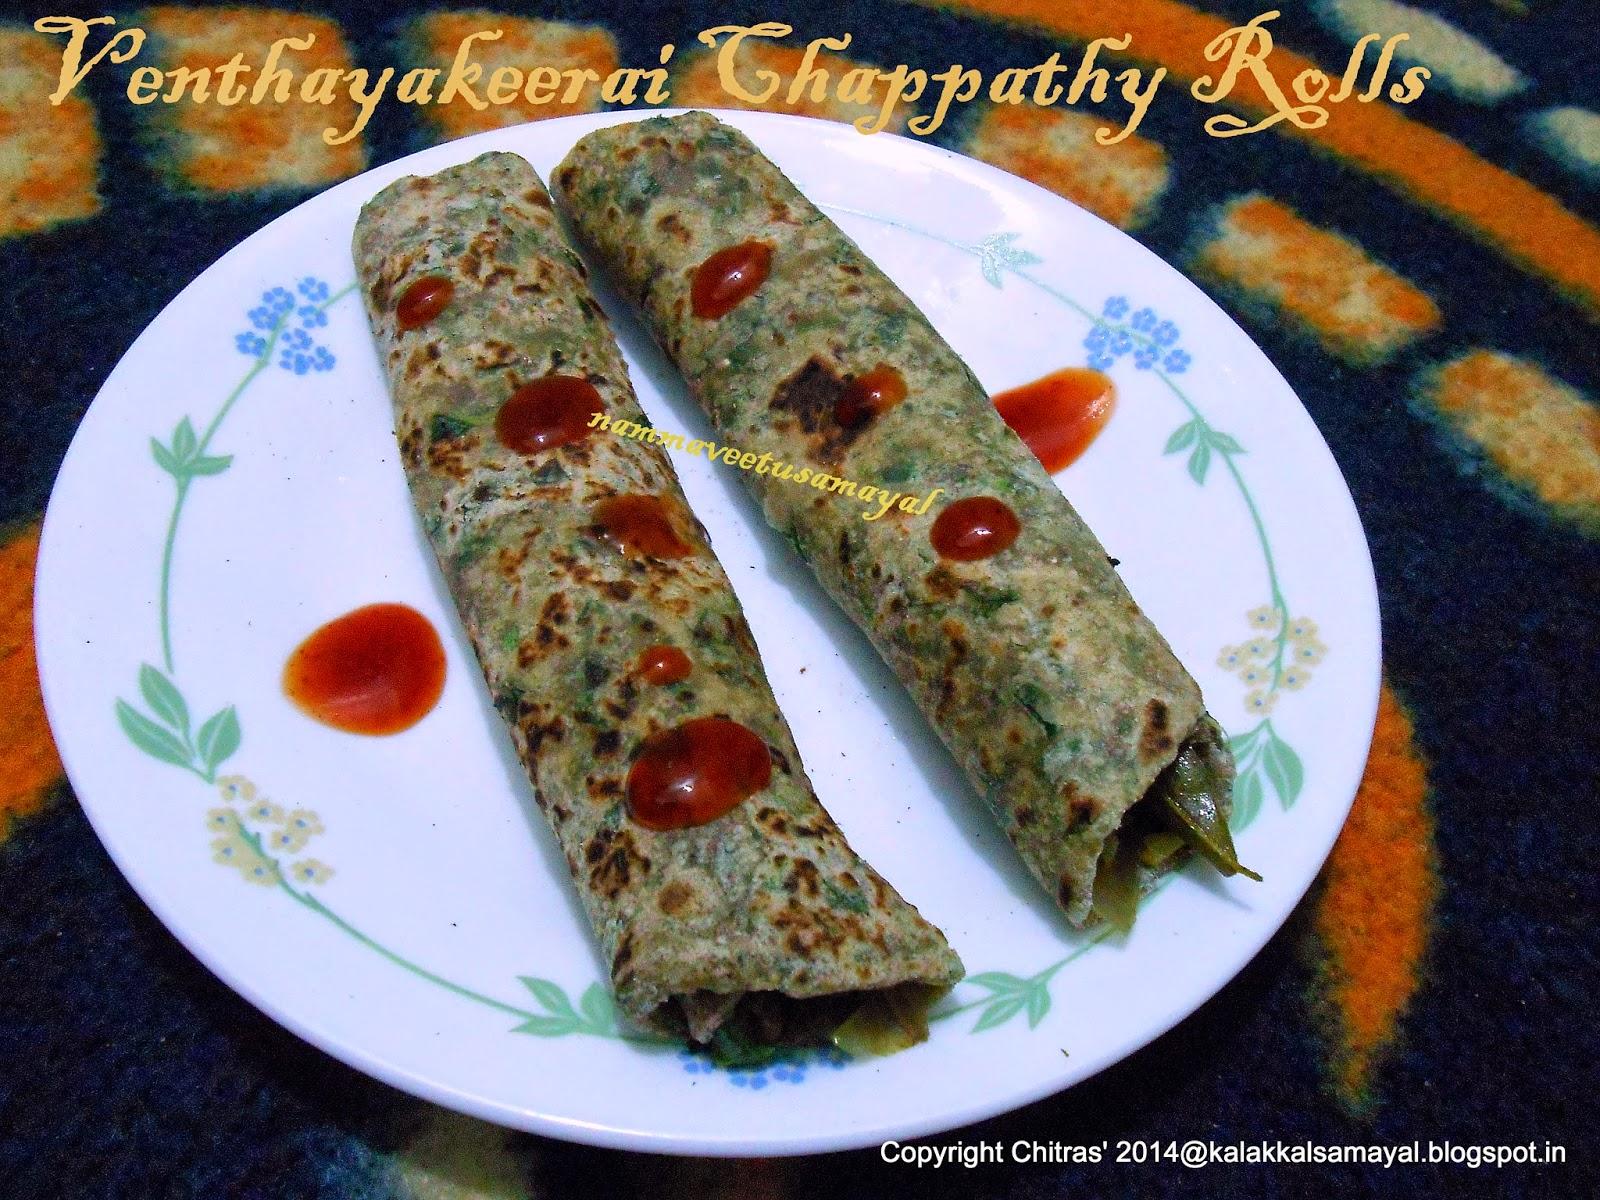 Venthayakeerai Chappathy roll [ Fenugreek leaves chappathy roll ]